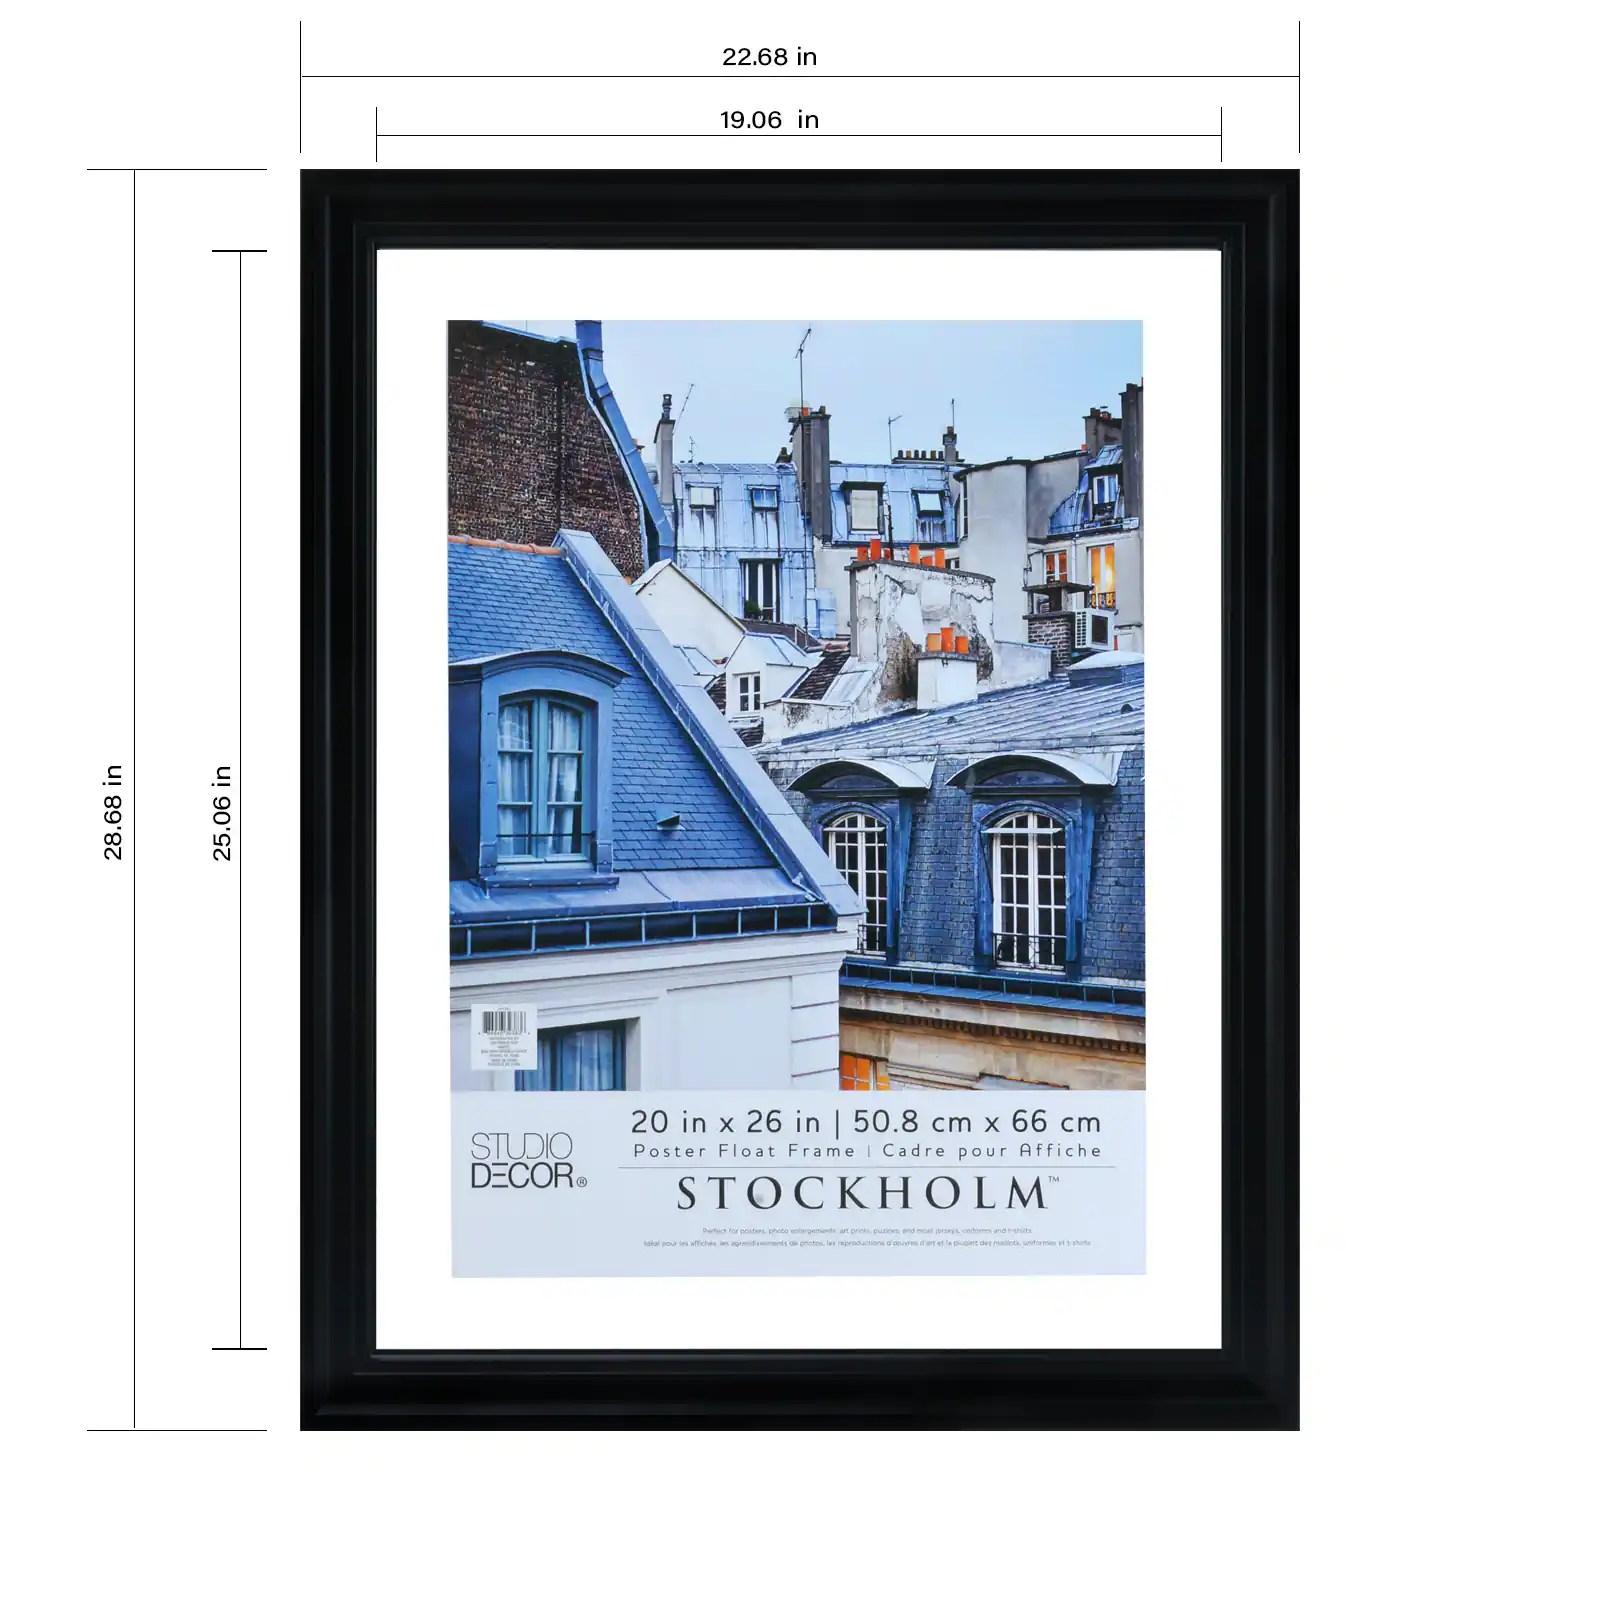 black 20 x 26 float poster frame stockholm by studio decor